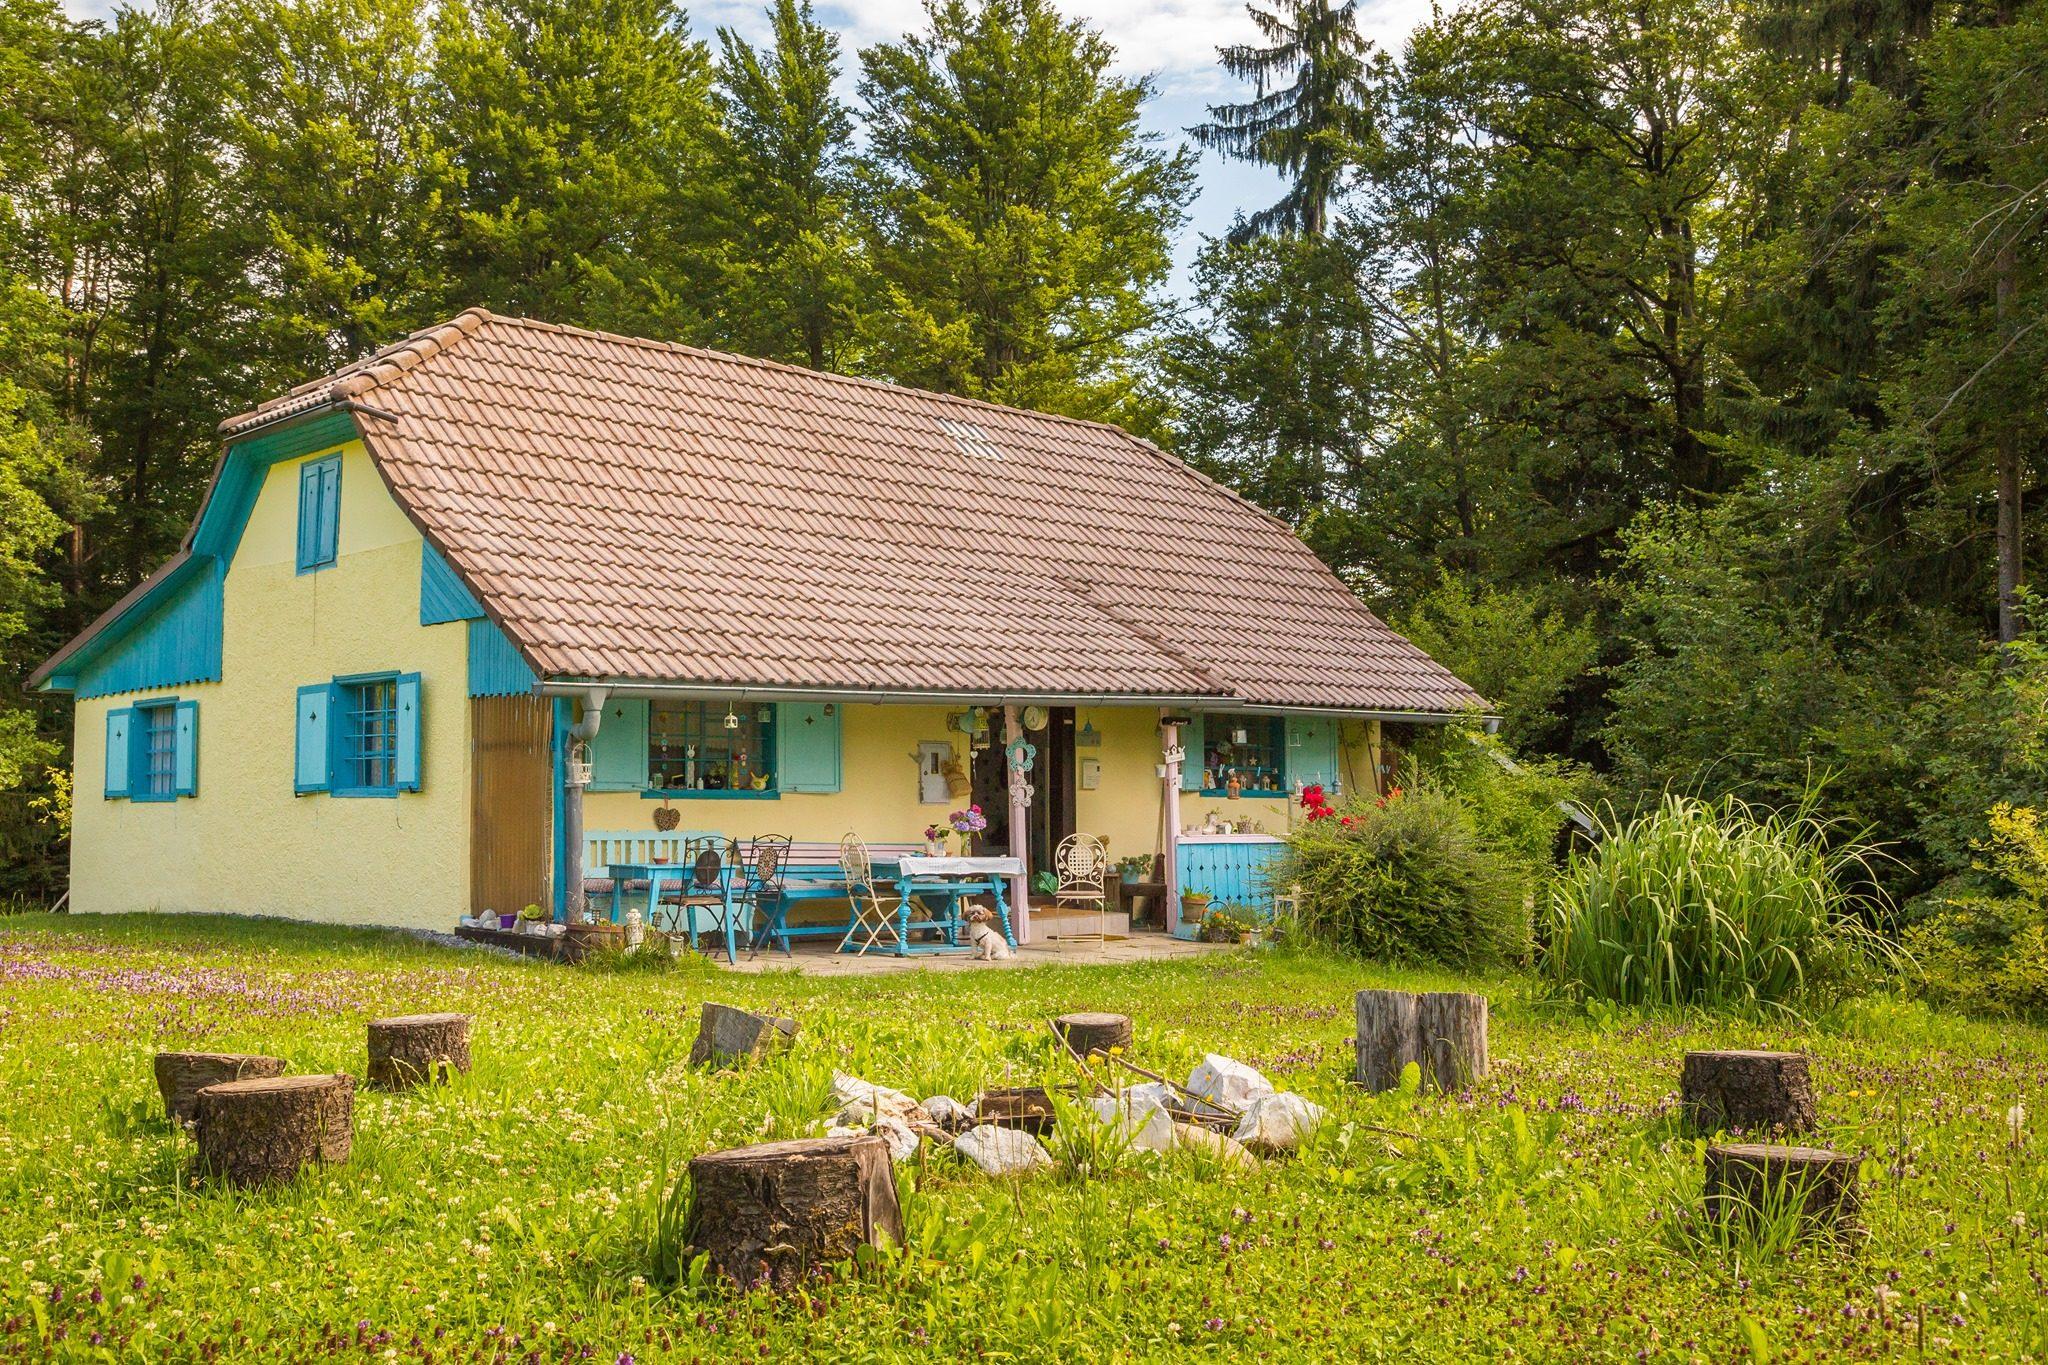 Modra hiška 1-visit-braslovce